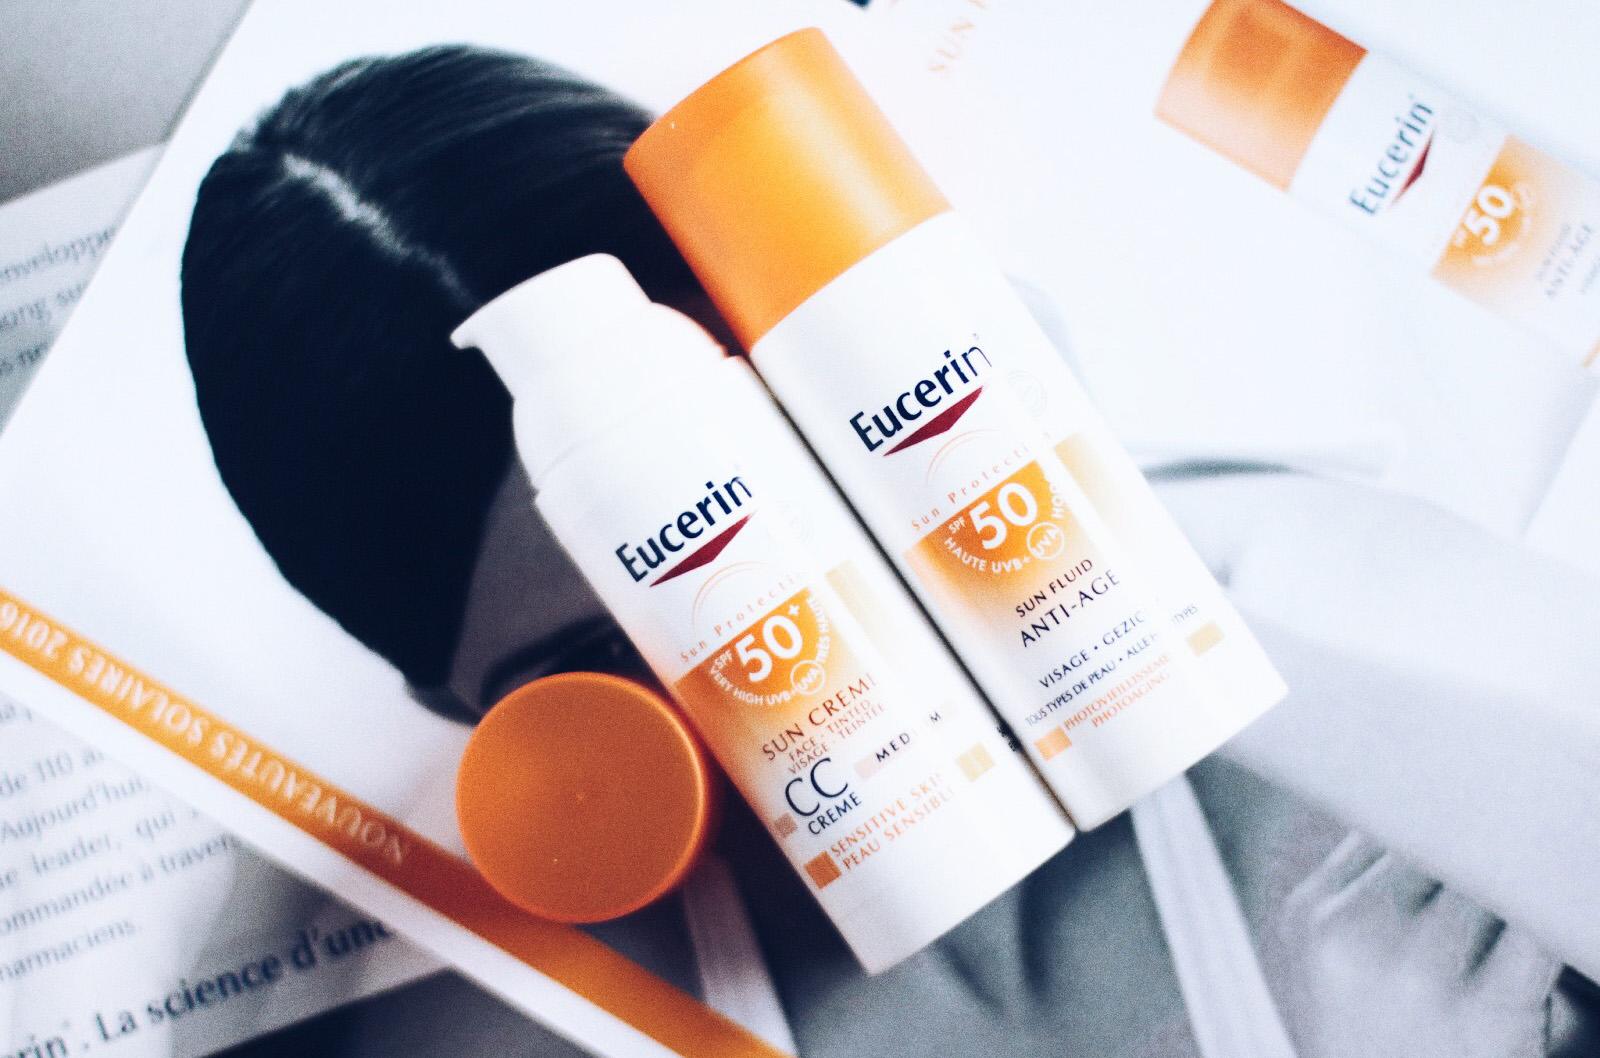 eucerin fluide anti age solaire cc crème spf 50 avis test